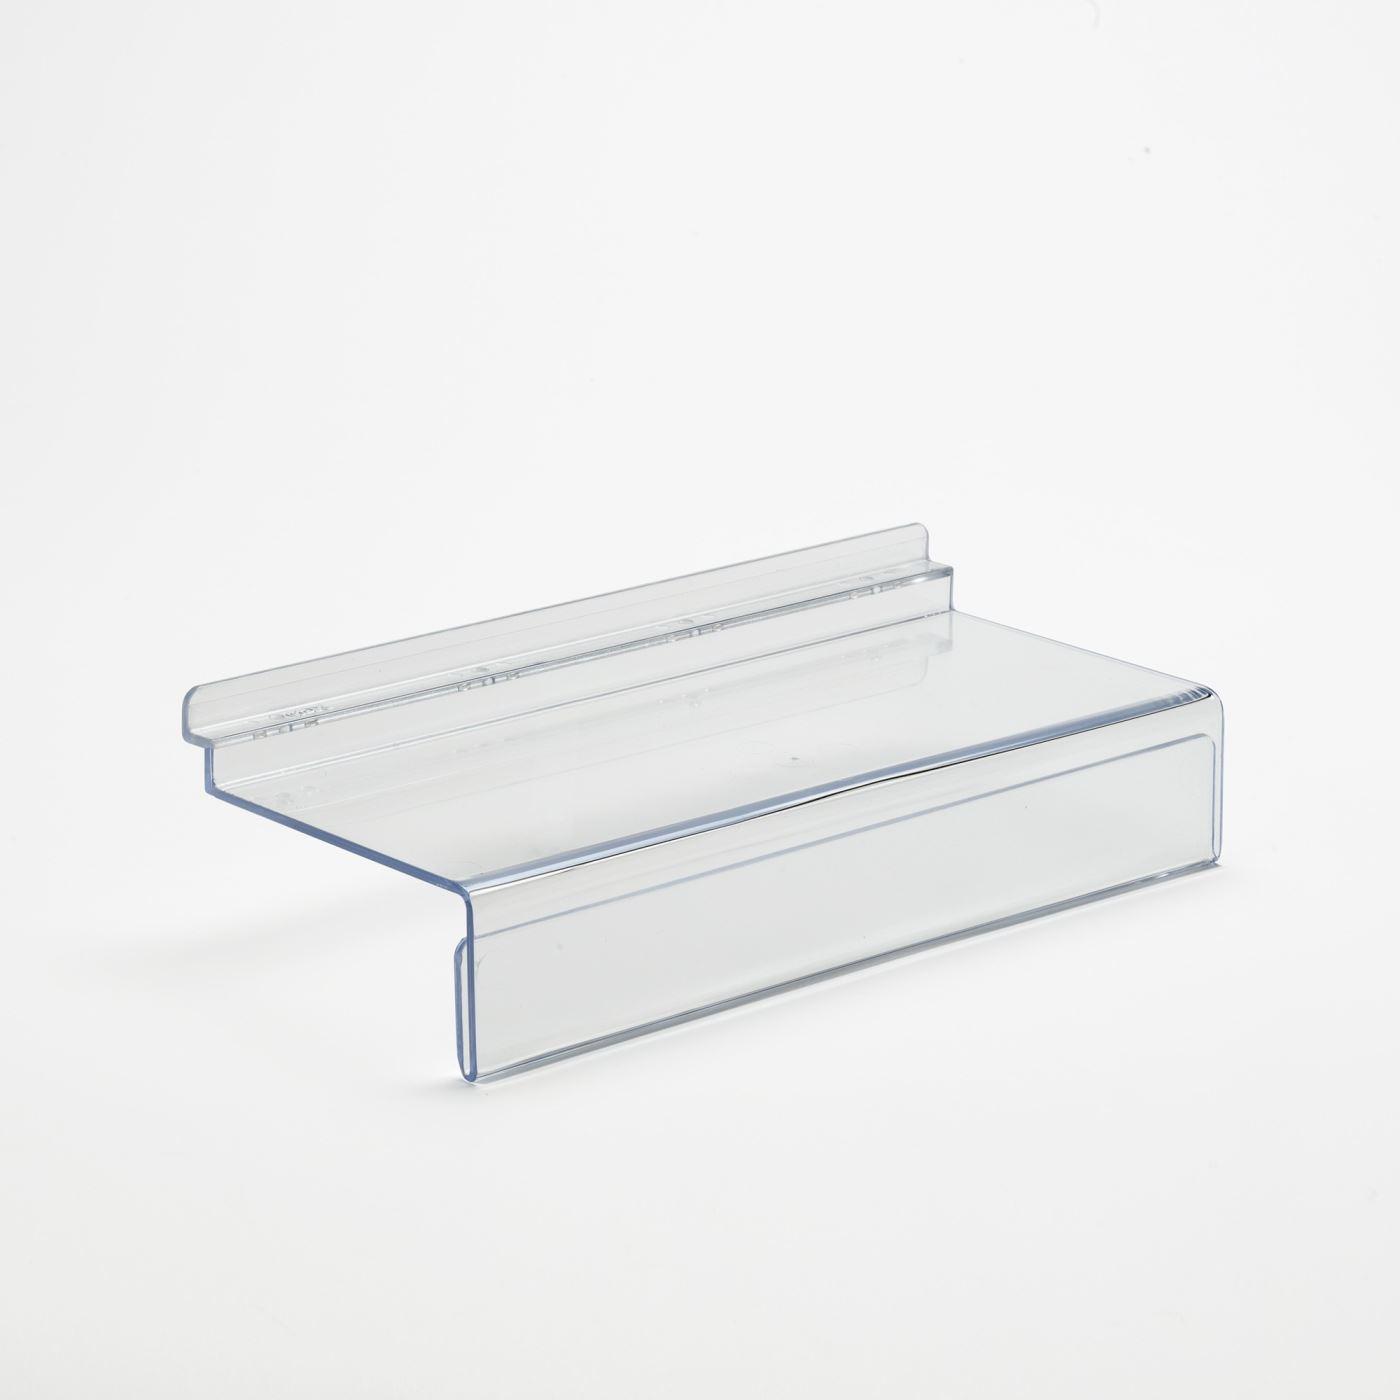 Slatwall Shelf With 40mm Ticket Holder: 250mm (W) x 40mm (H) x 100mm (D)